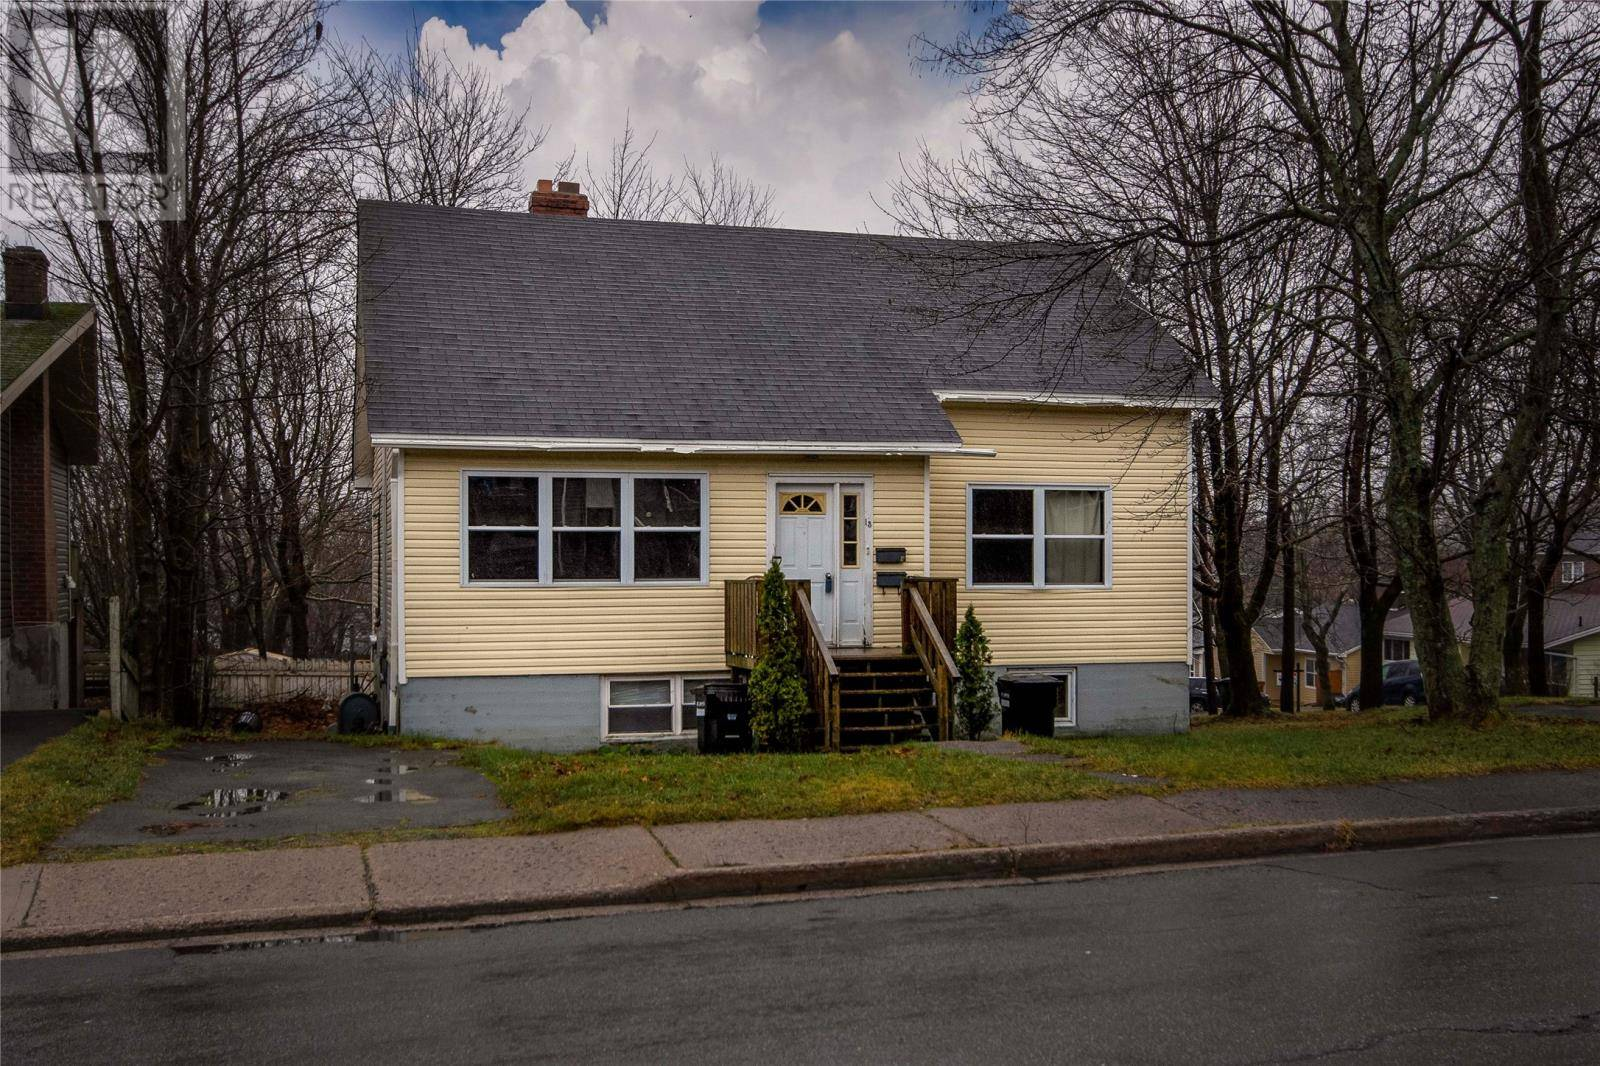 Townhouse for sale at 13 Argyle St St. John's Newfoundland - MLS: 1207646